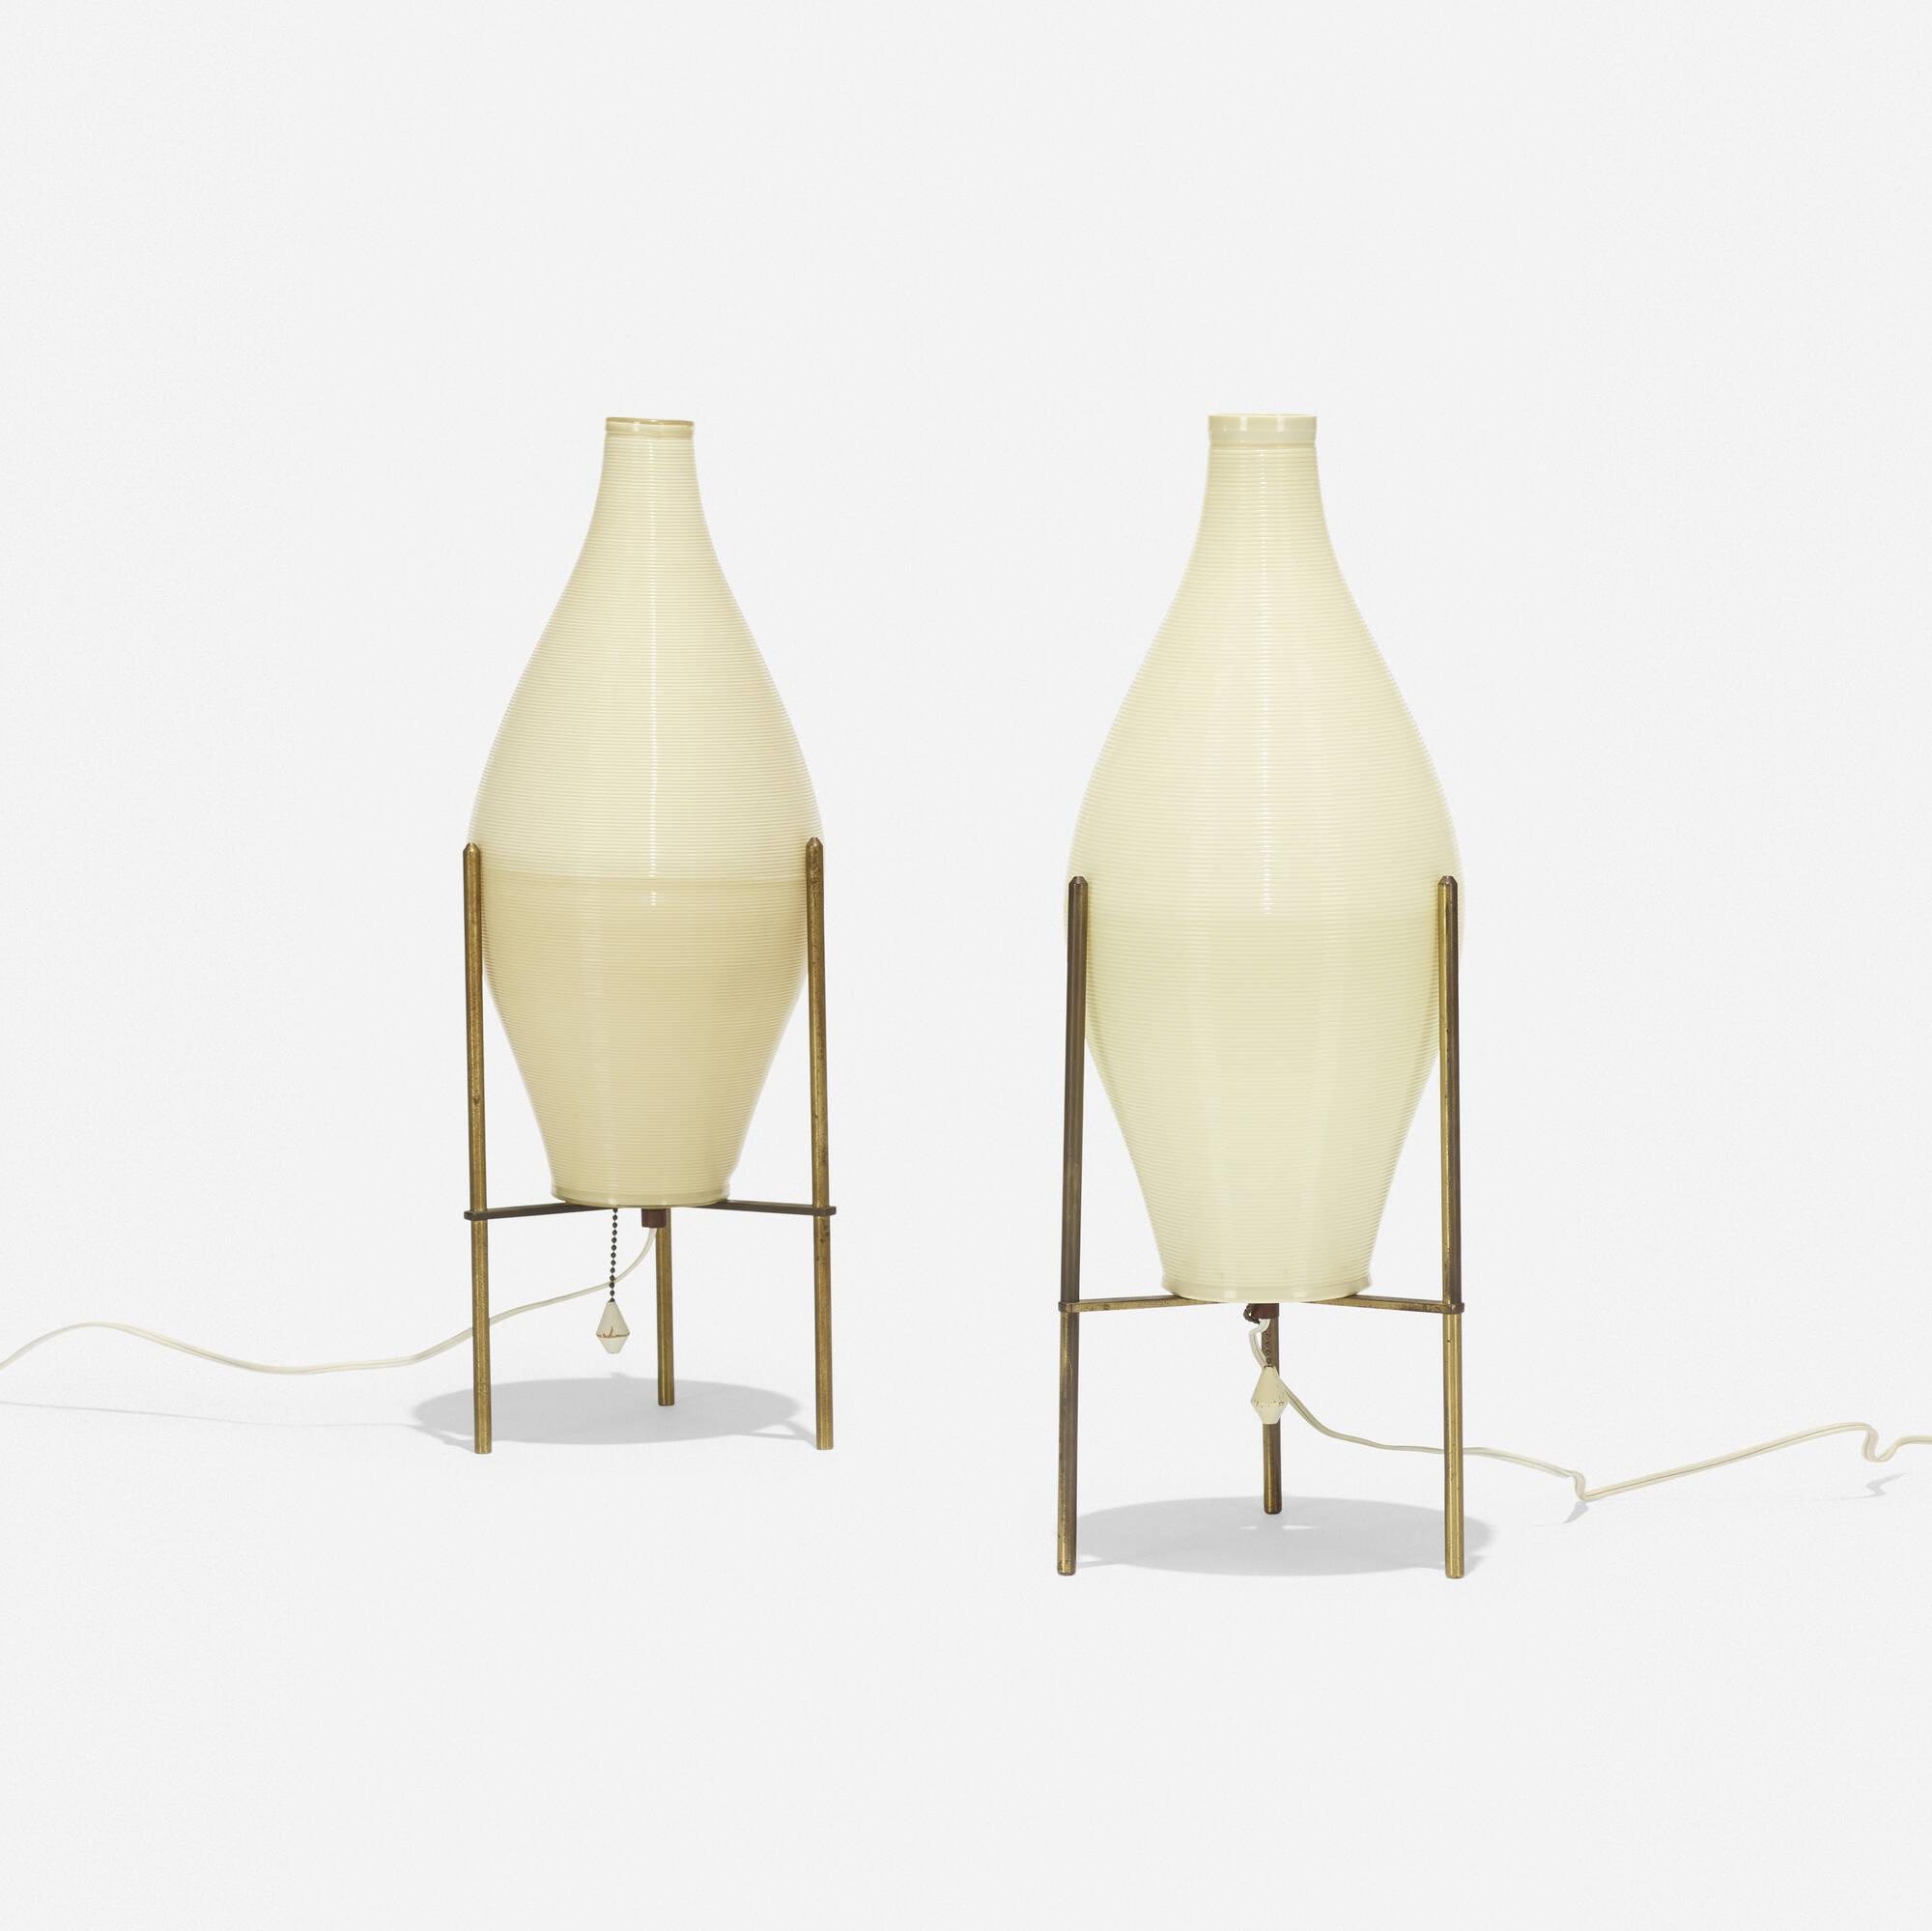 232: Yasha Heifetz / Rotaflex table lamps, pair (1 of 2)